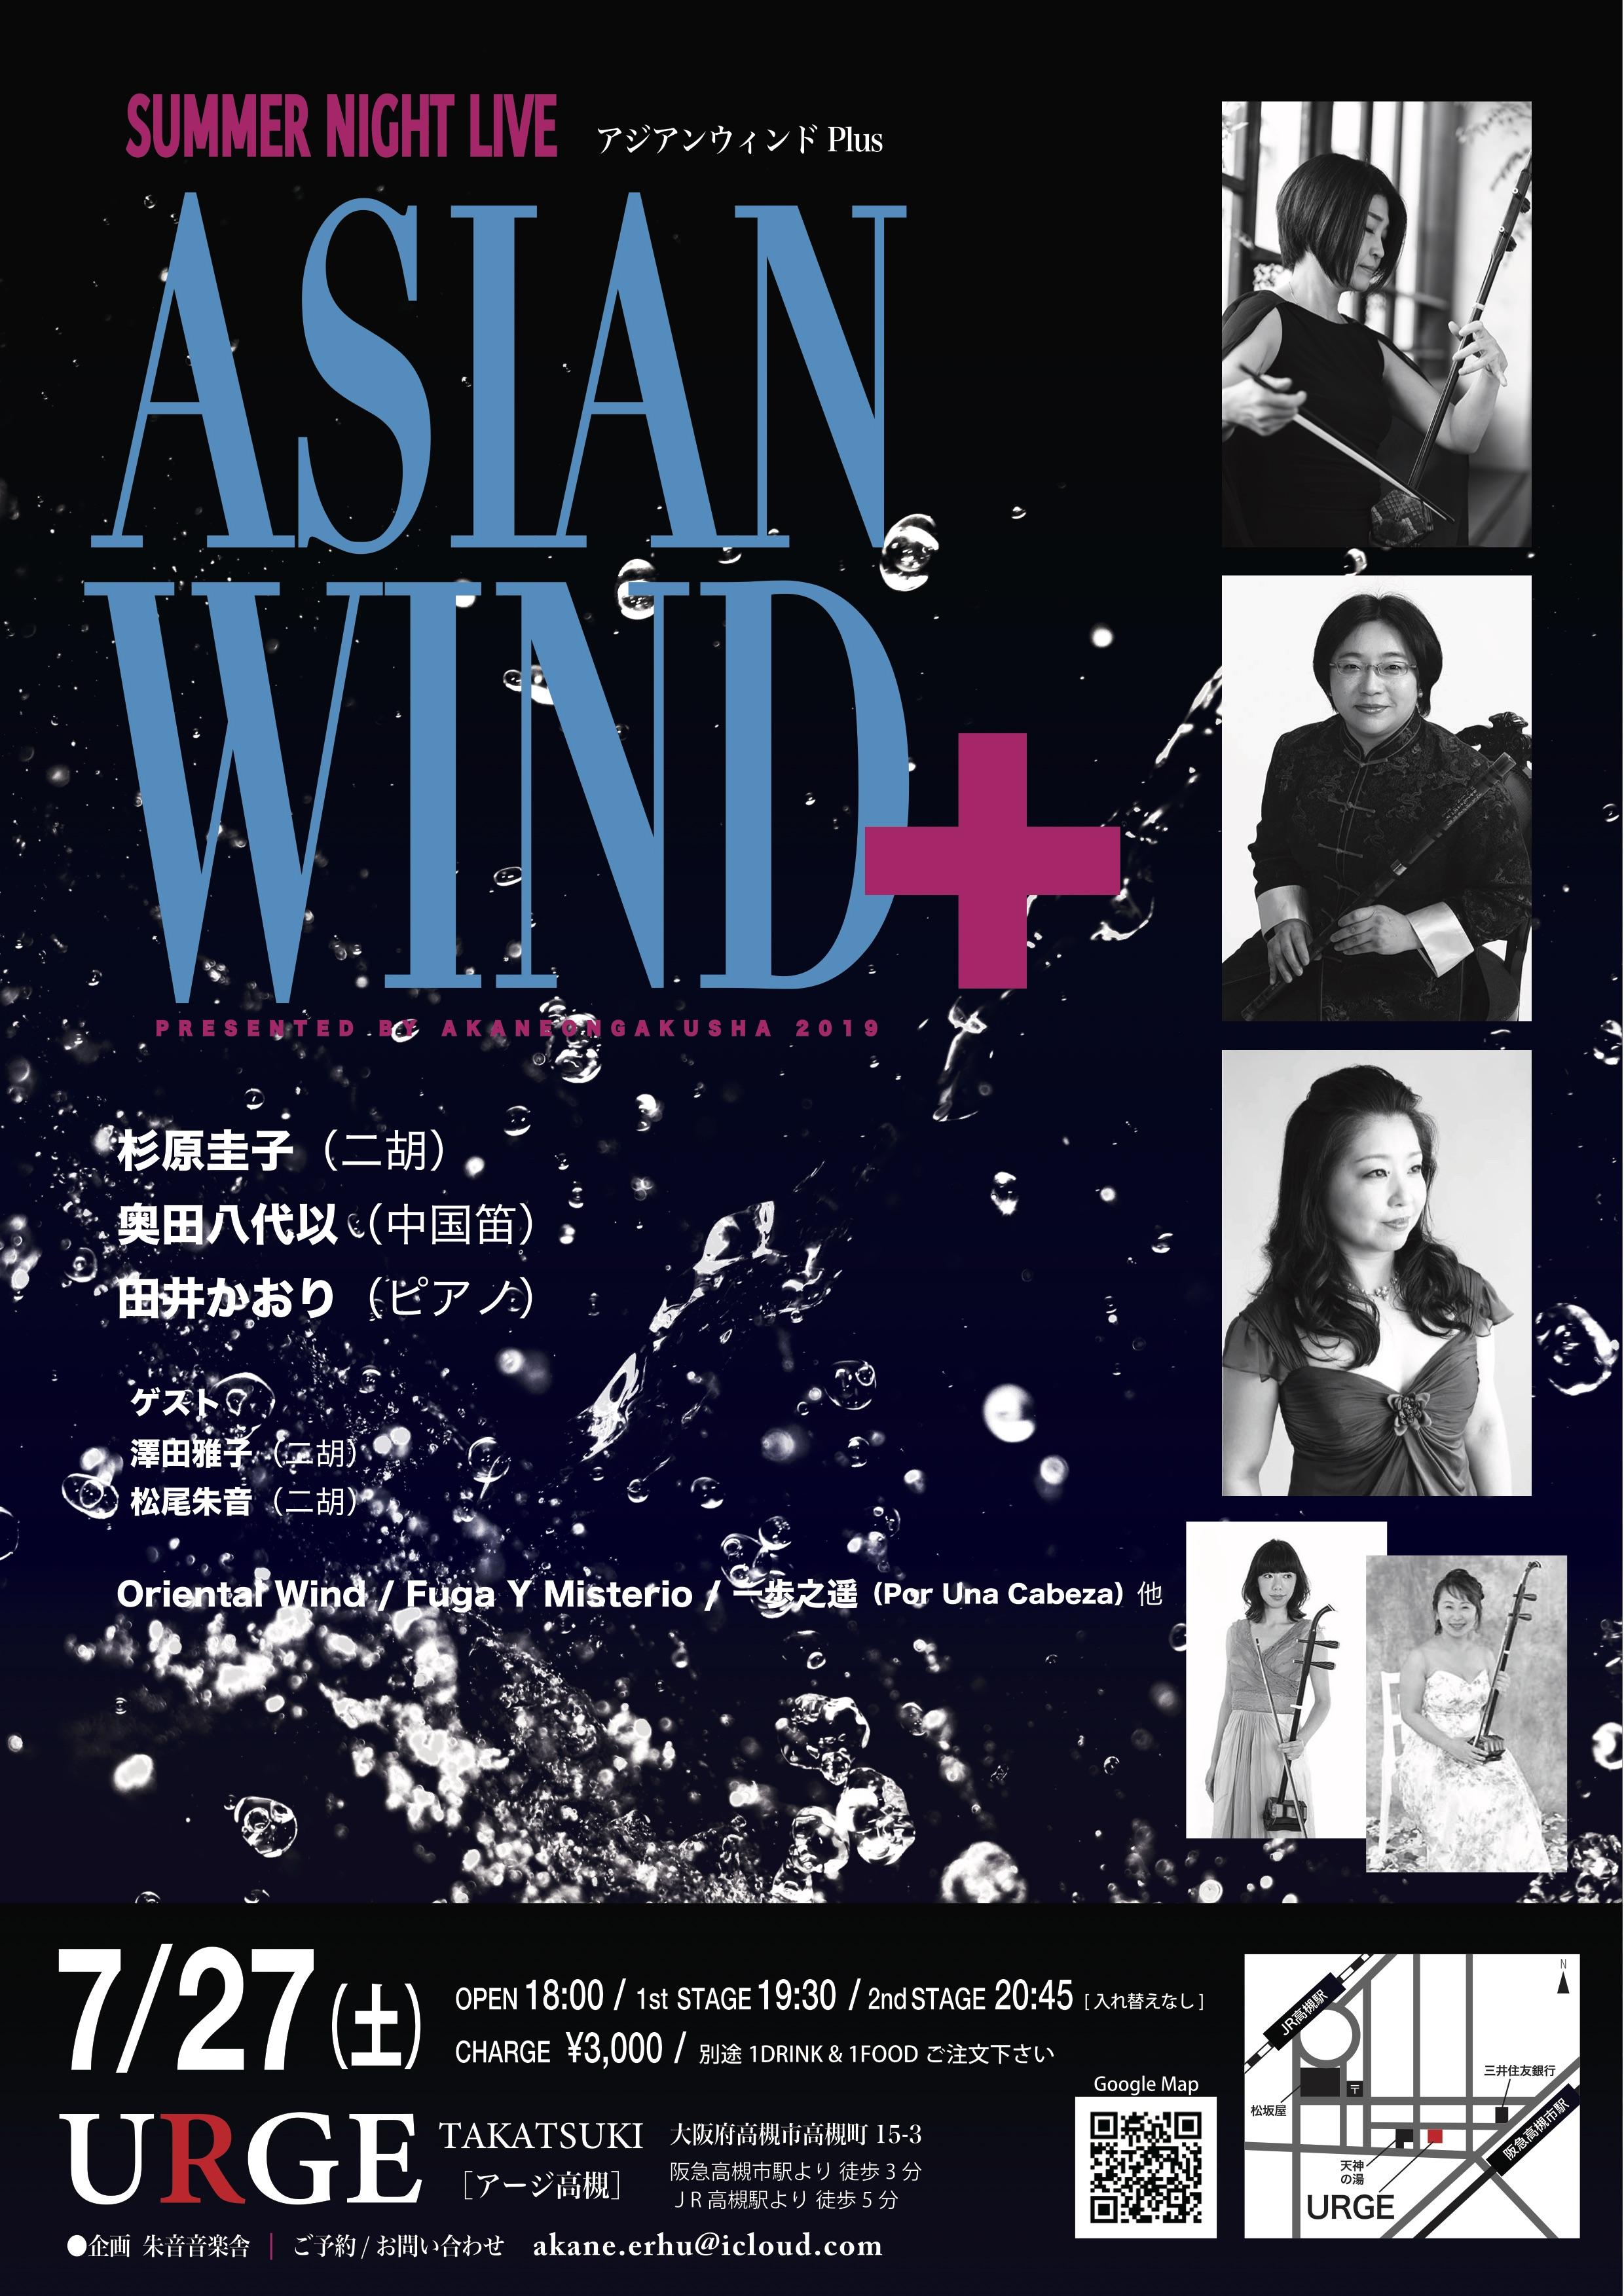 SUMMER NIGHT LIVE ASIAN WIND + 二胡の仲間たち 二胡:杉原圭子  中国笛:奥田八代以  ピアノ:田井かおり